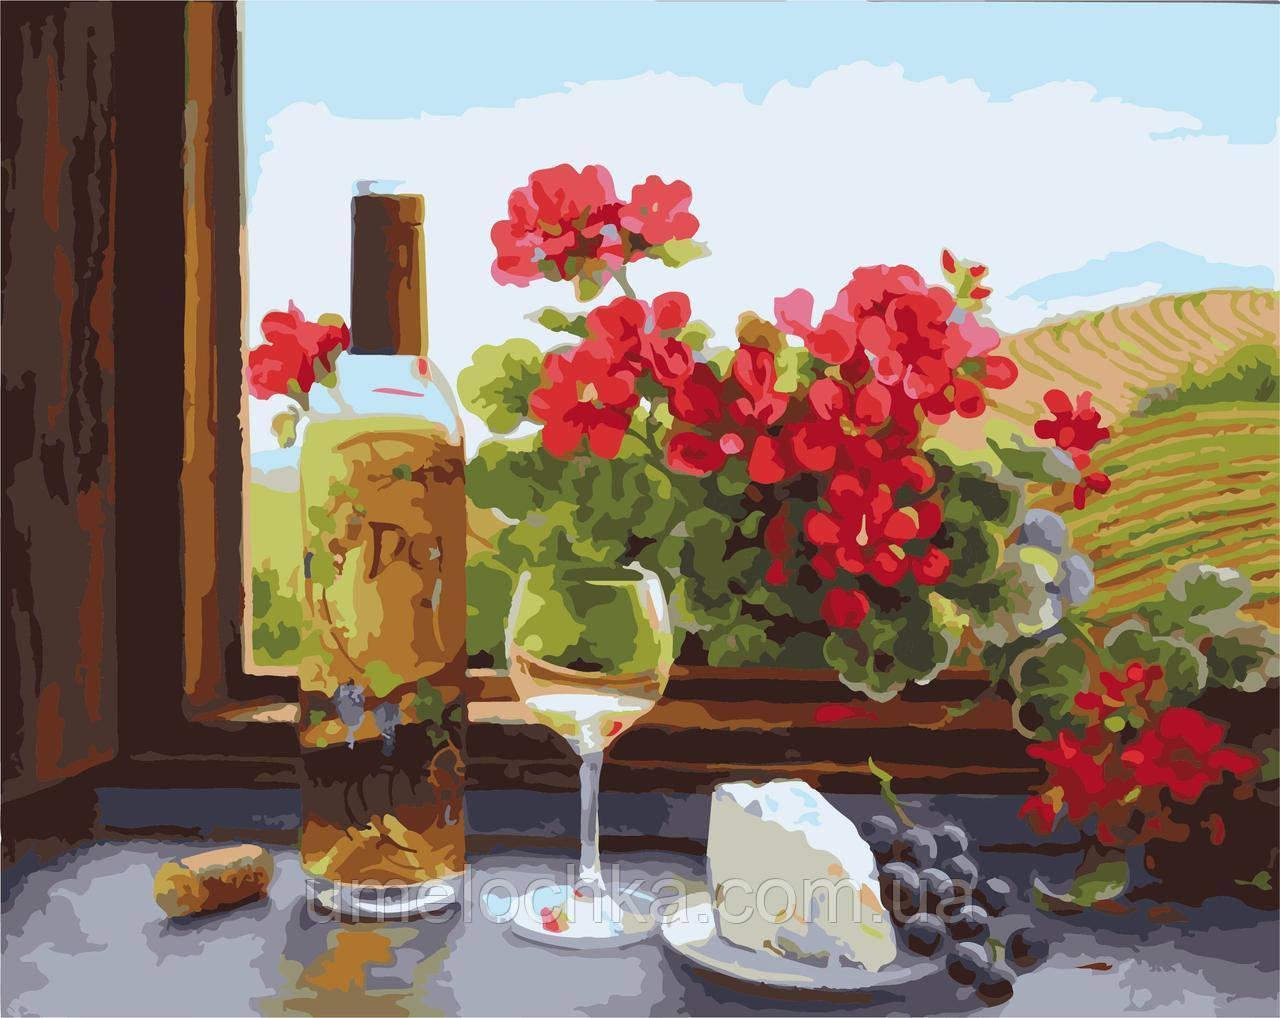 Раскраска по номерам без коробки Идейка Натюрморт с вином и геранью Худ Фран Ди Джакомо (KHO2205) 40 х 50 см